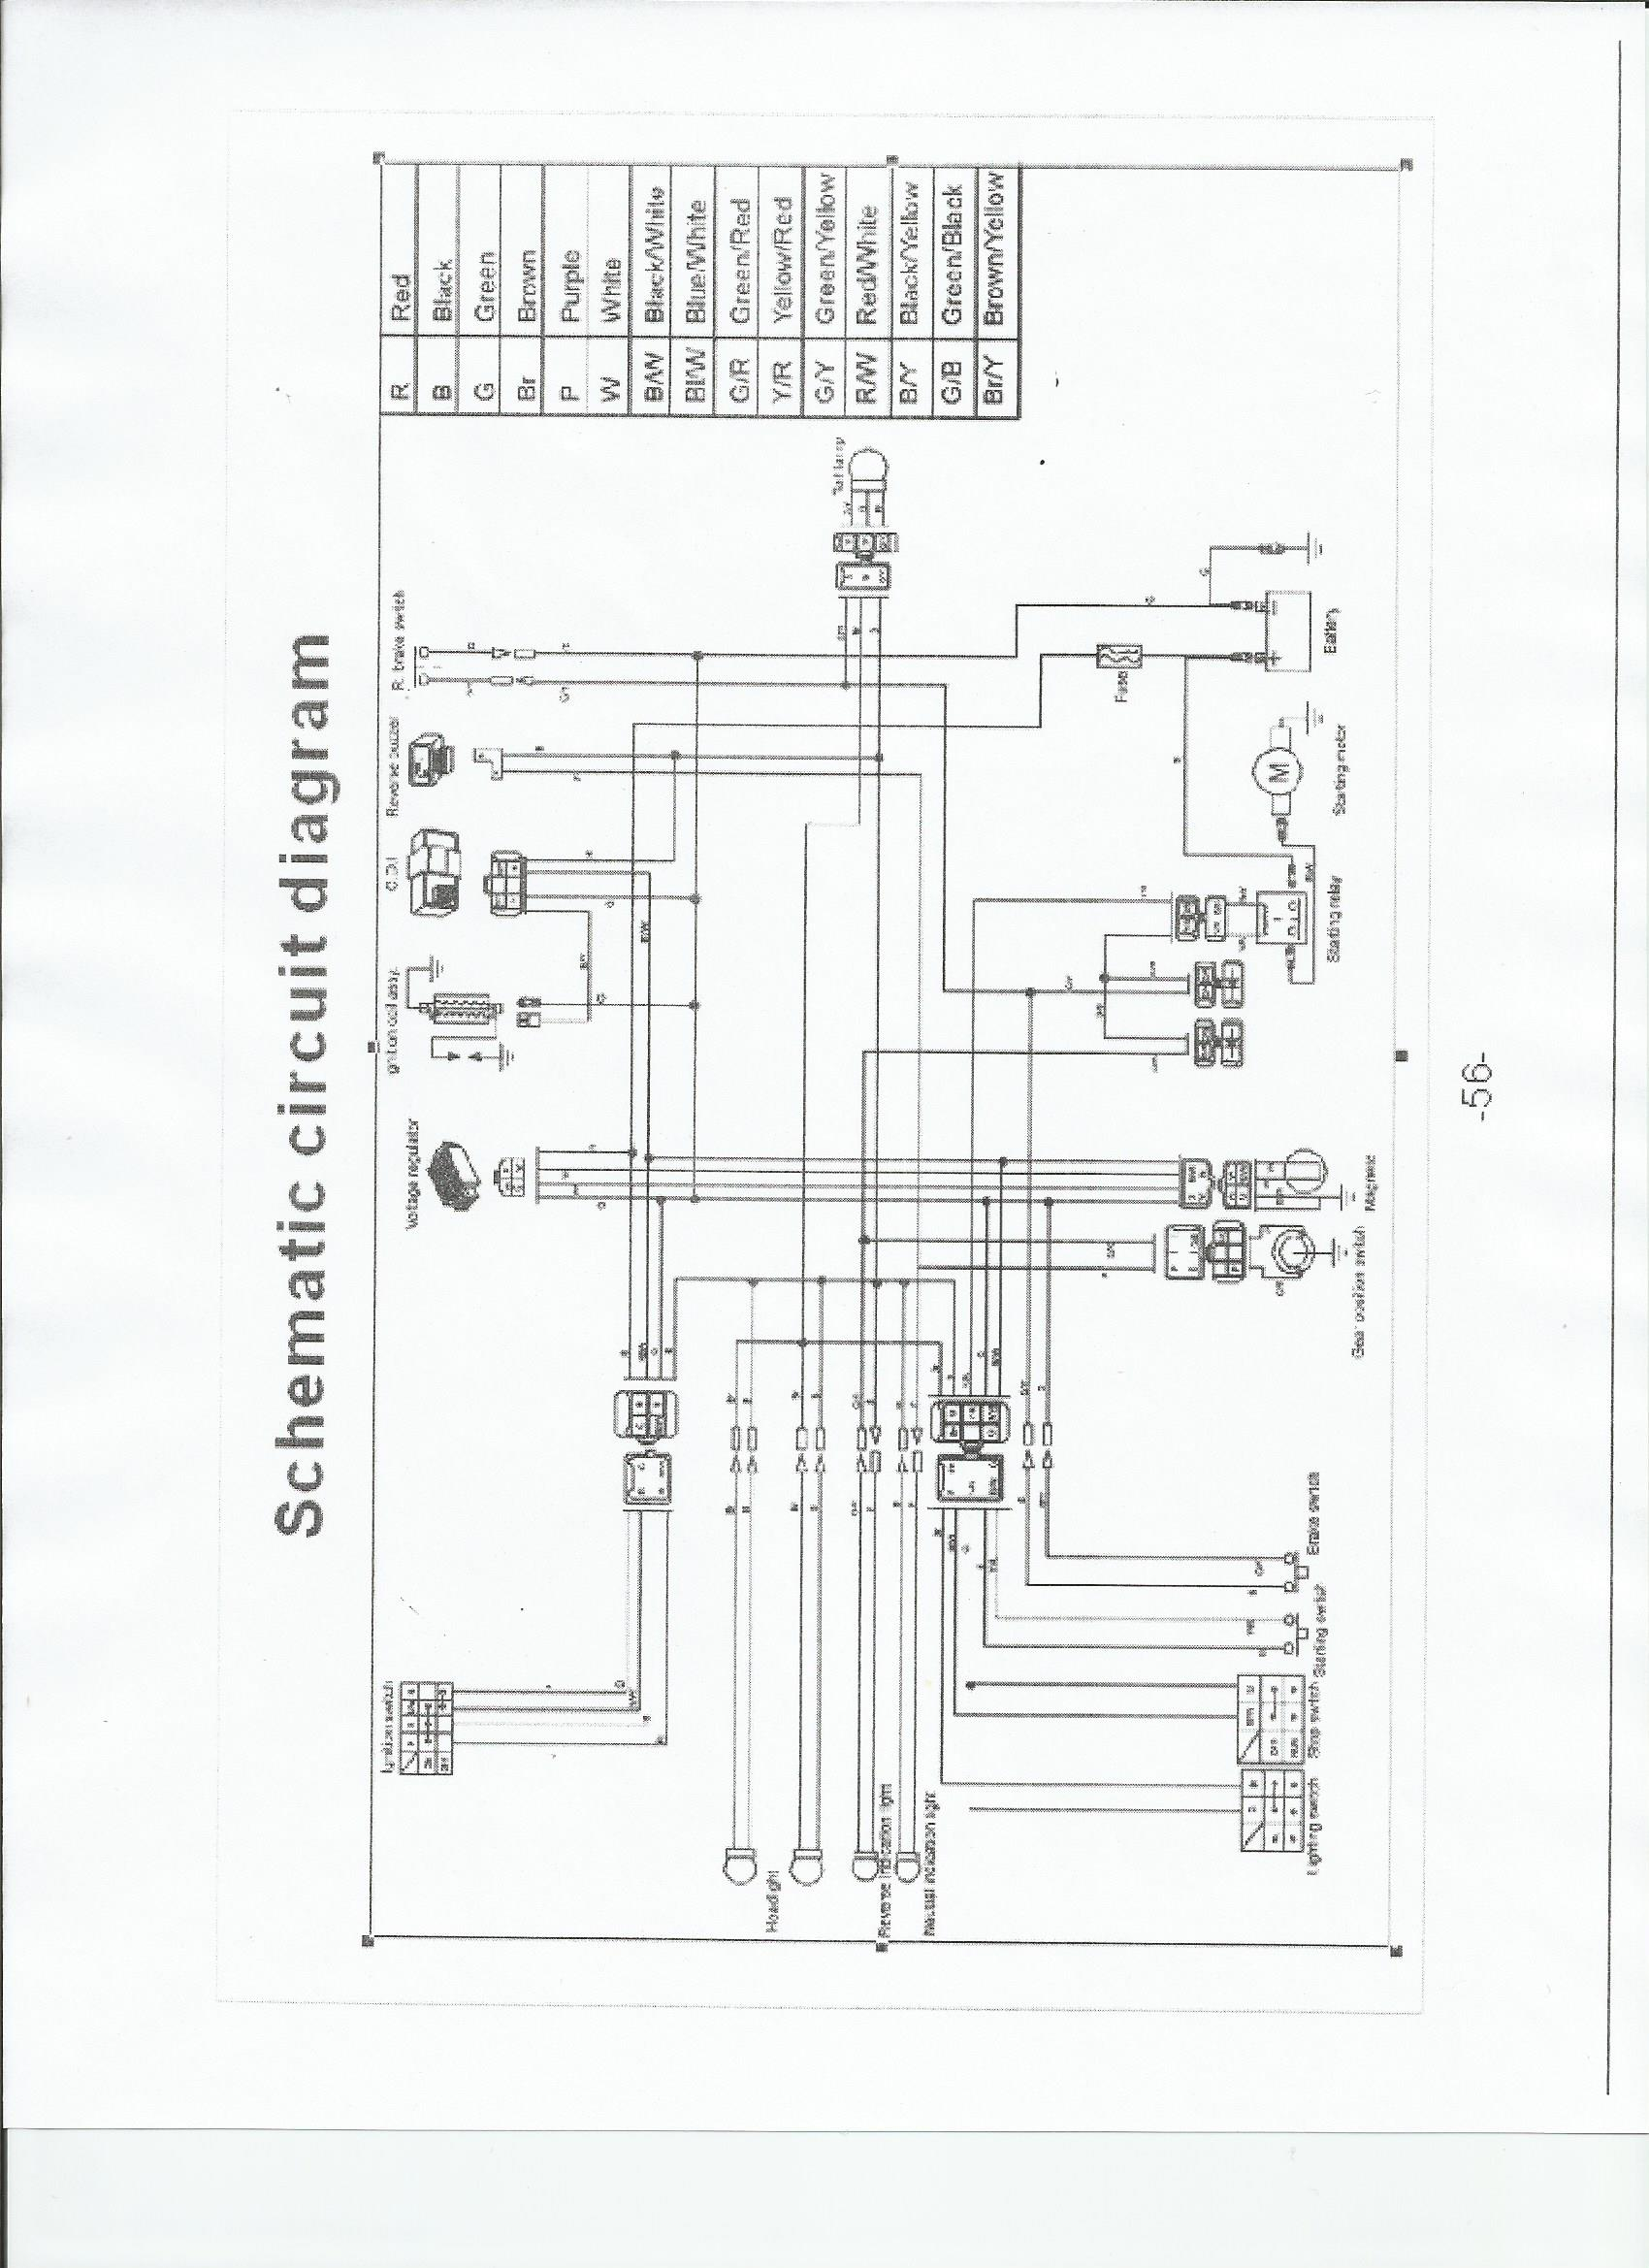 Wiring Diagram For Atv - Wiring Diagram More on kazuma 150 wiring diagram, kazuma 250 wiring diagram, dingo go kart wiring-diagram, chinese go kart wiring-diagram, gy6 150cc wiring-diagram, kazuma cdi ignition wiring diagram, chinese quad wiring-diagram, 150cc go kart wiring-diagram, 110 quad wiring-diagram, kazuma meerkat 50 wiring, kazuma 90cc parts diagram clutch,